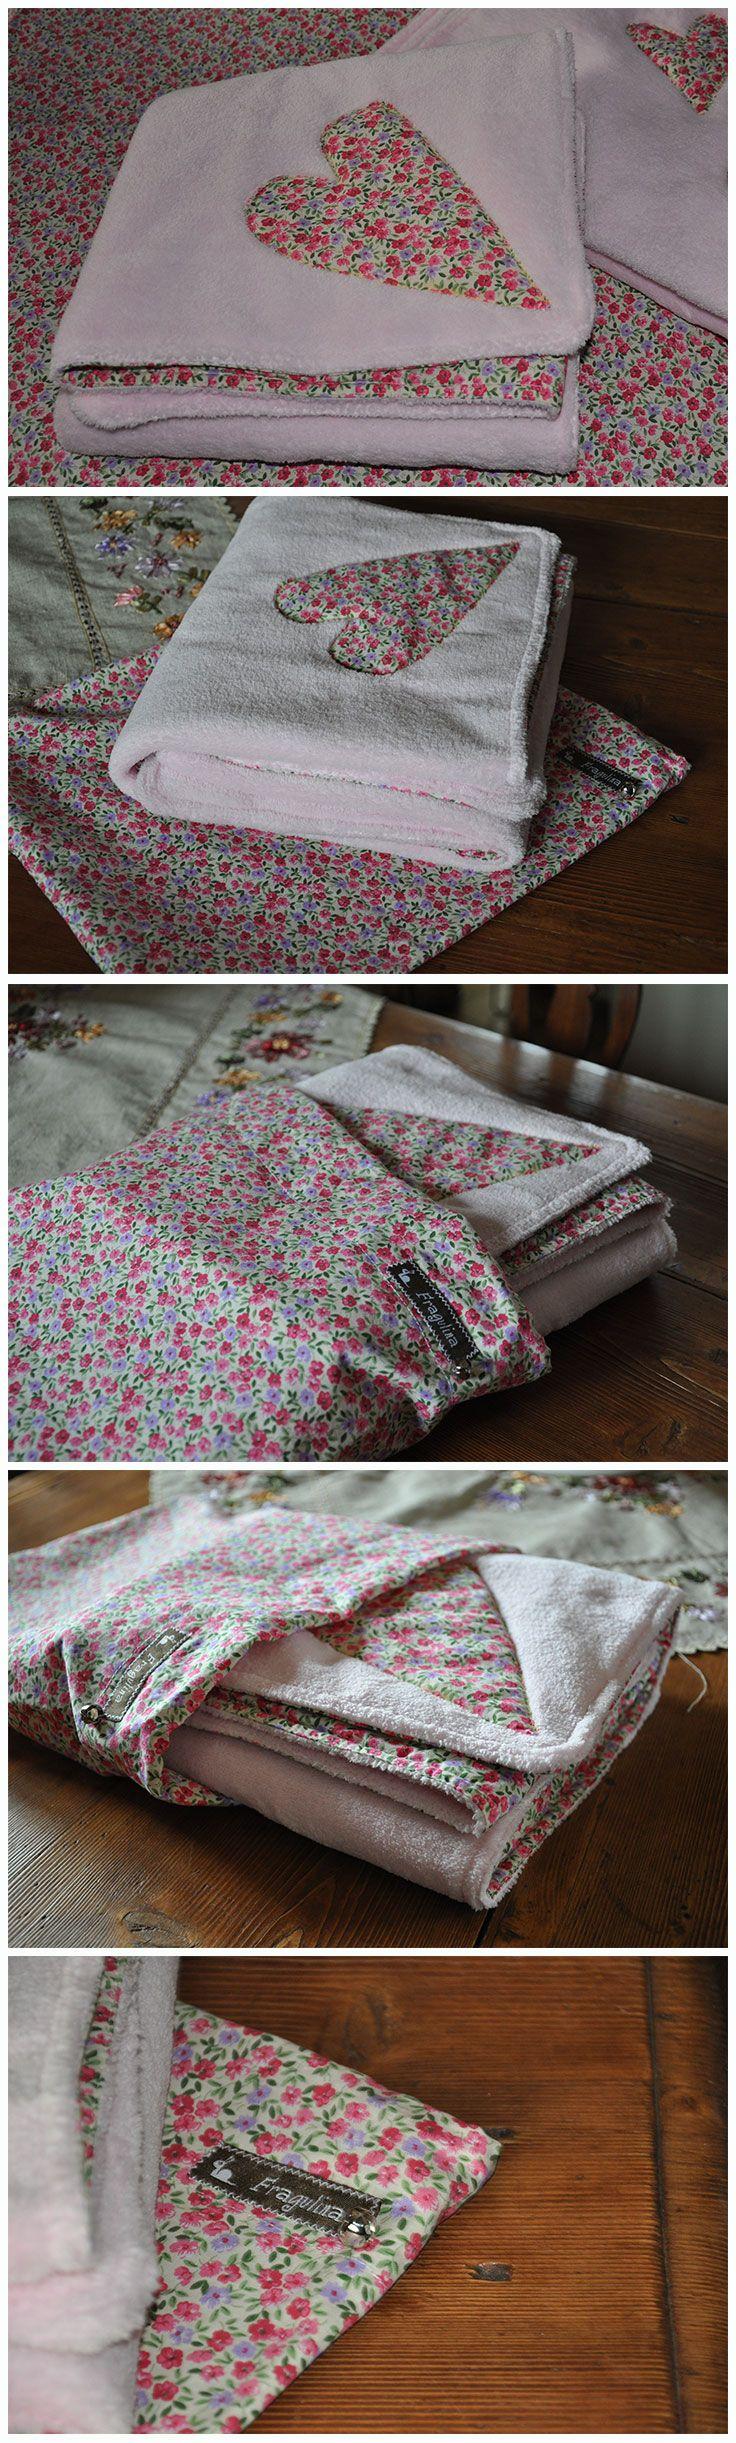 New baby-born gift: warm, soft Fragulina's blanket with sack. #diy #fragulina #sewing